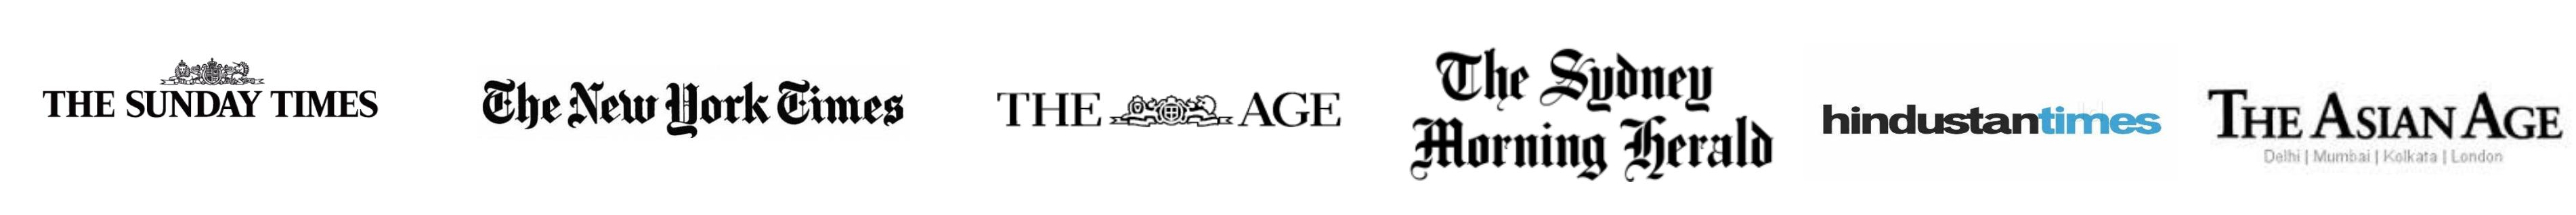 news-logo-banner